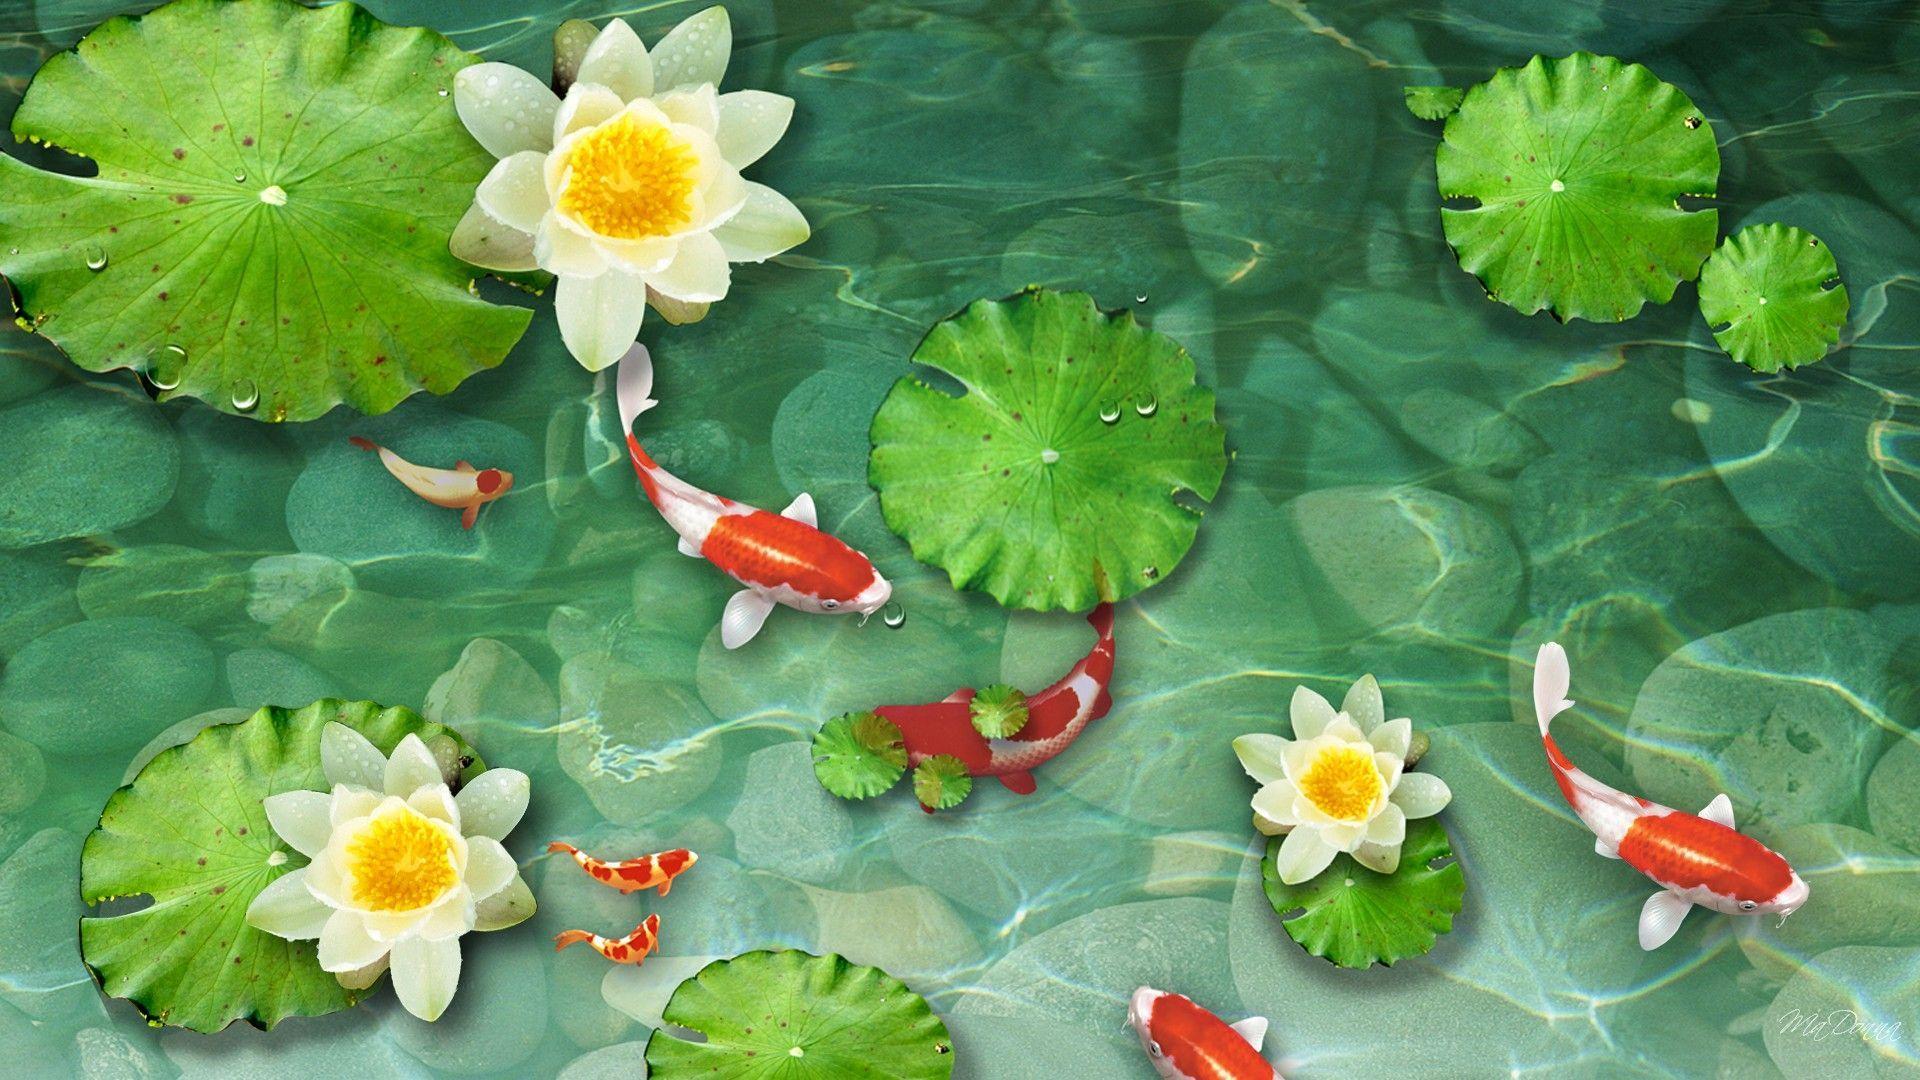 Koi Pond Wallpapers Wallpaper Cave Koi Fish Drawings Koi Pond